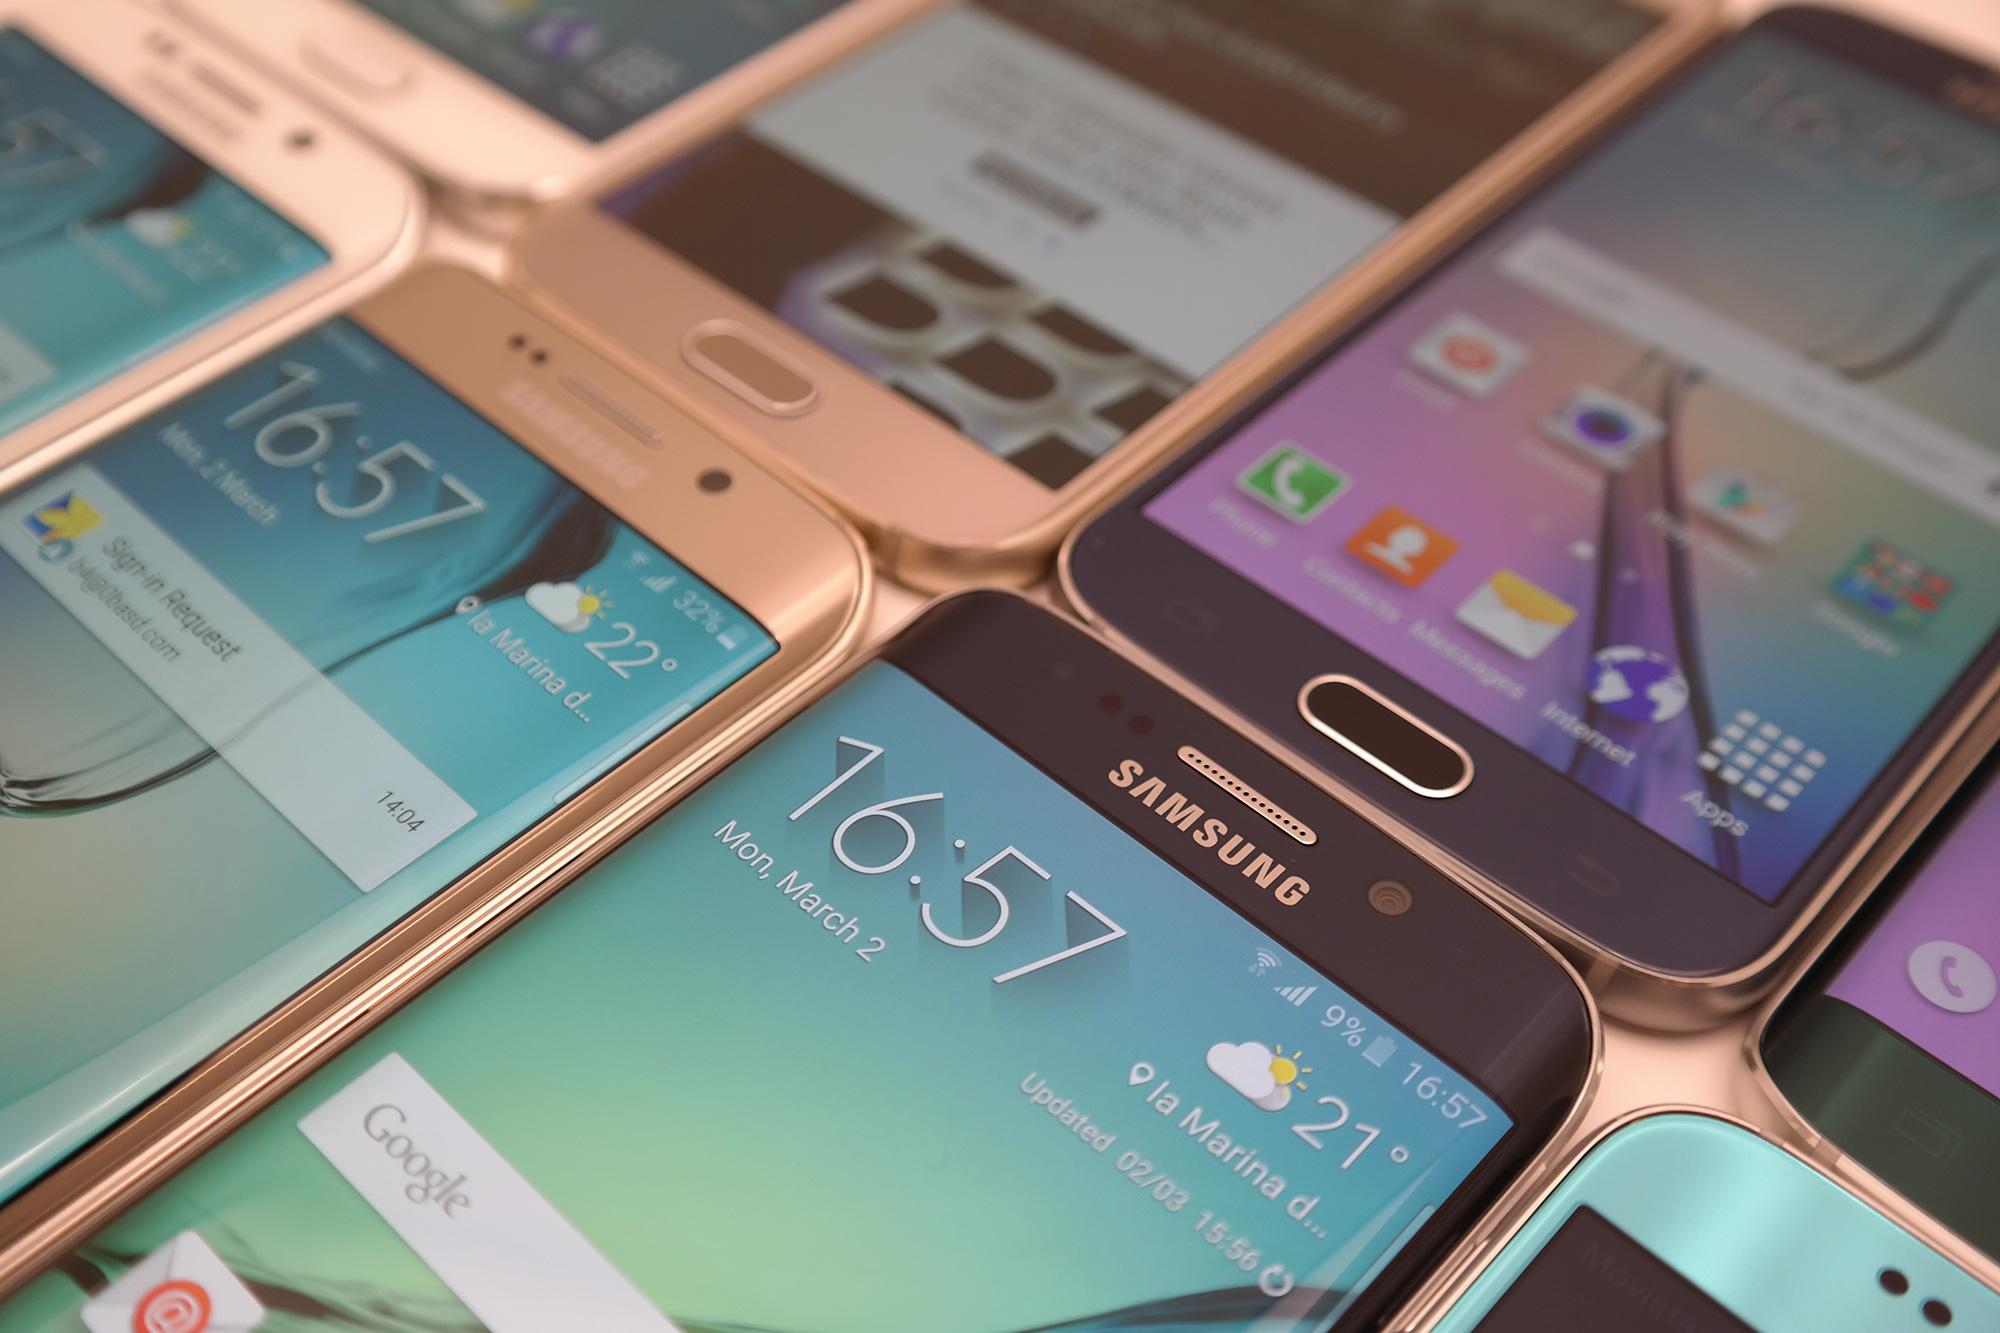 Samsung Galaxy S6 mit bestem Smartphone-Display laut DisplayMate